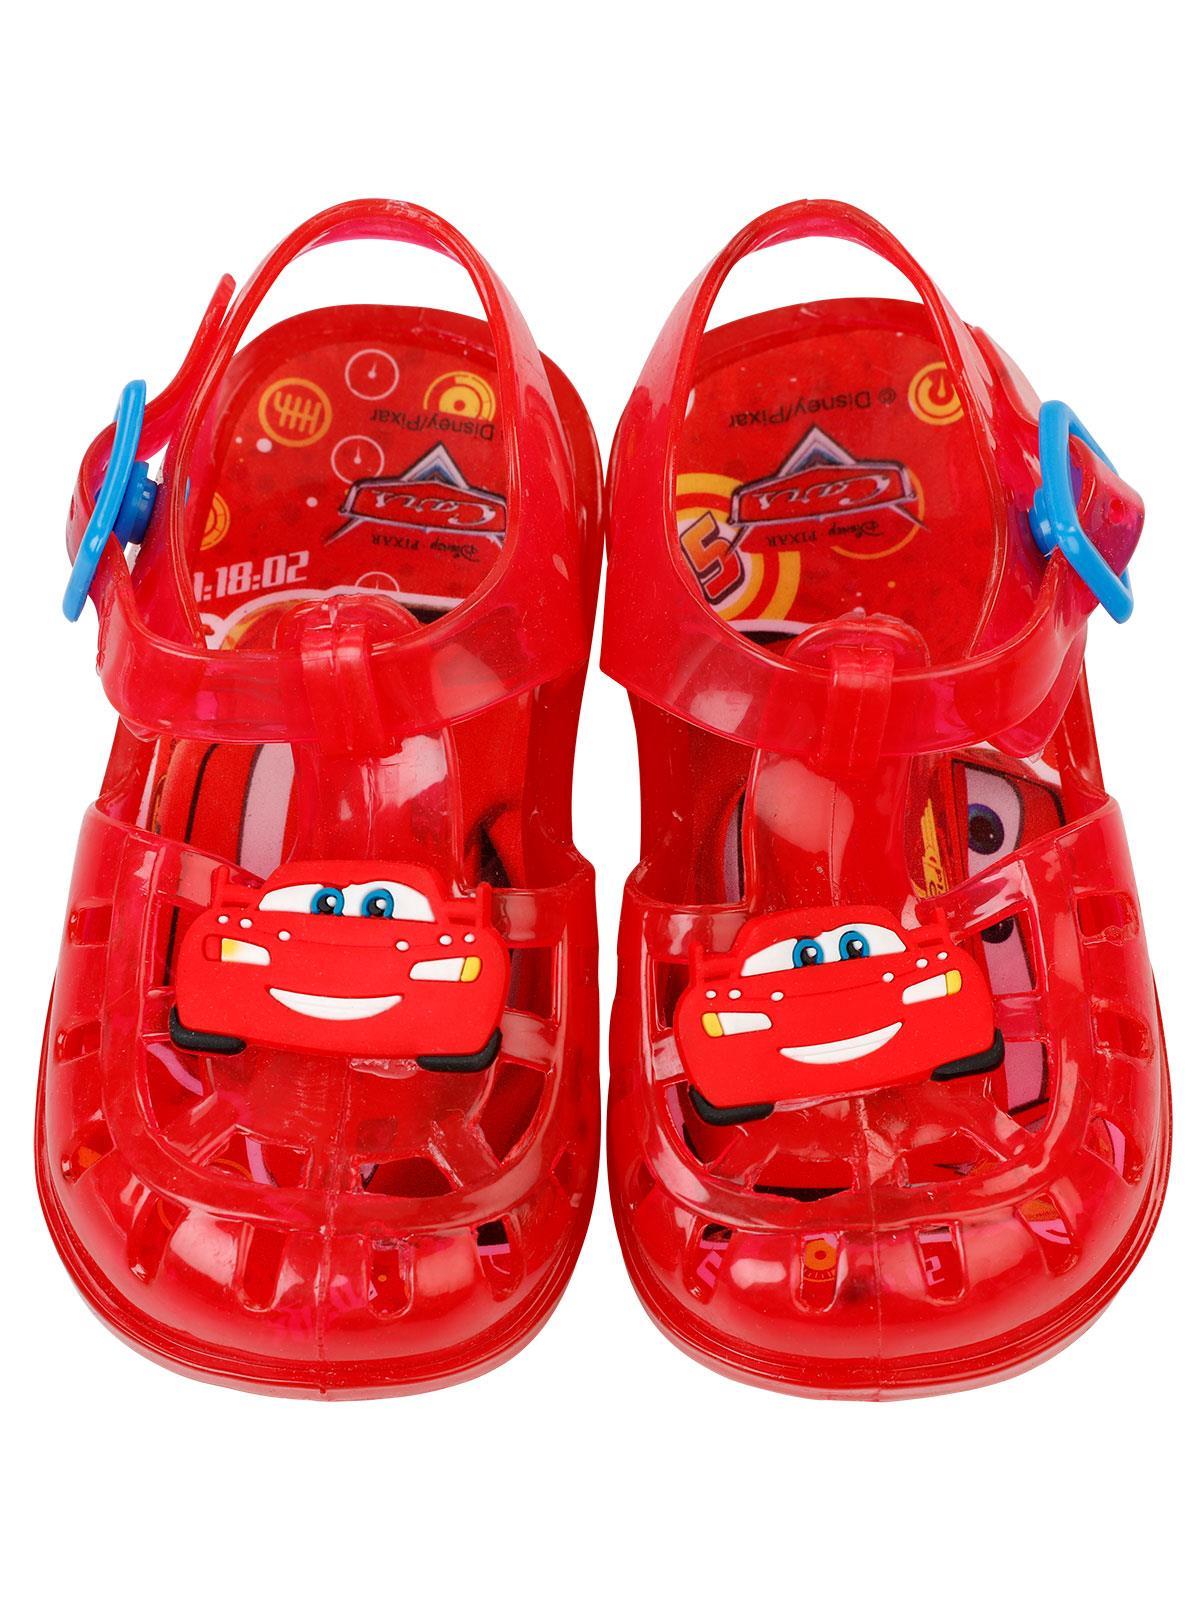 2020 summer boys girls slippers home kids outdoors beach pool Sandals soft non-slip bath slippers Crocs Slippers 21-29 size